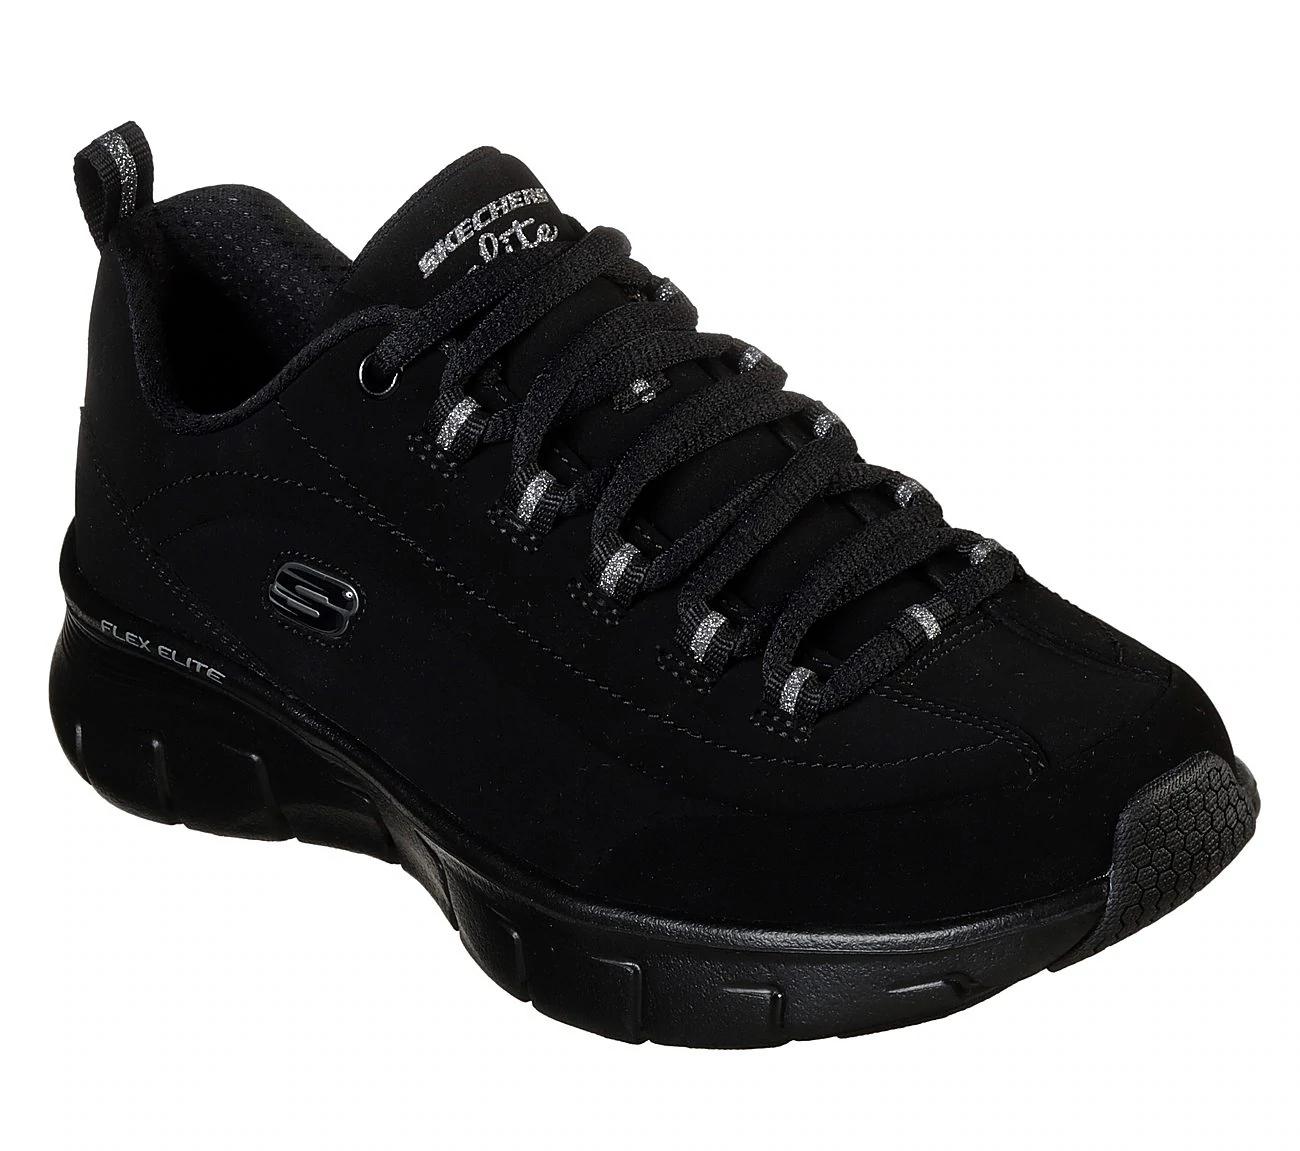 Black Nubuck Leather Lace Up Shoes